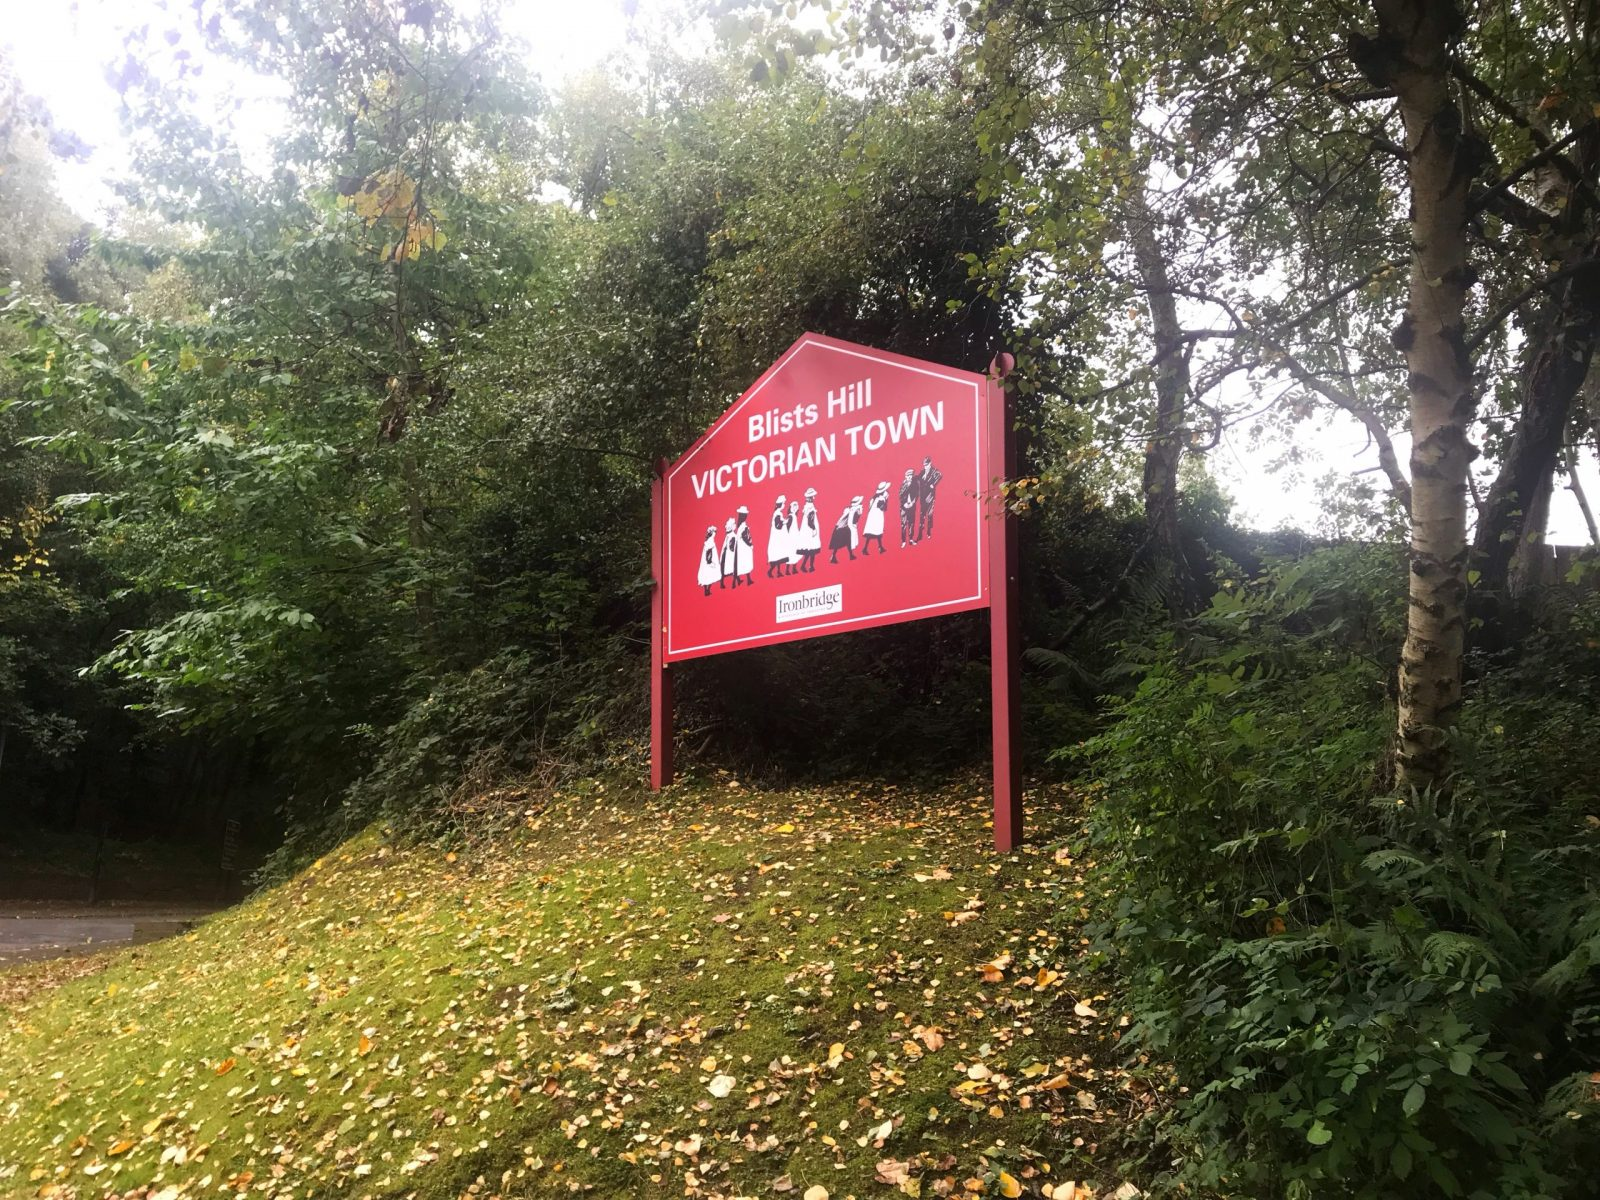 Visiting Ironbridge Blists hill victorian town